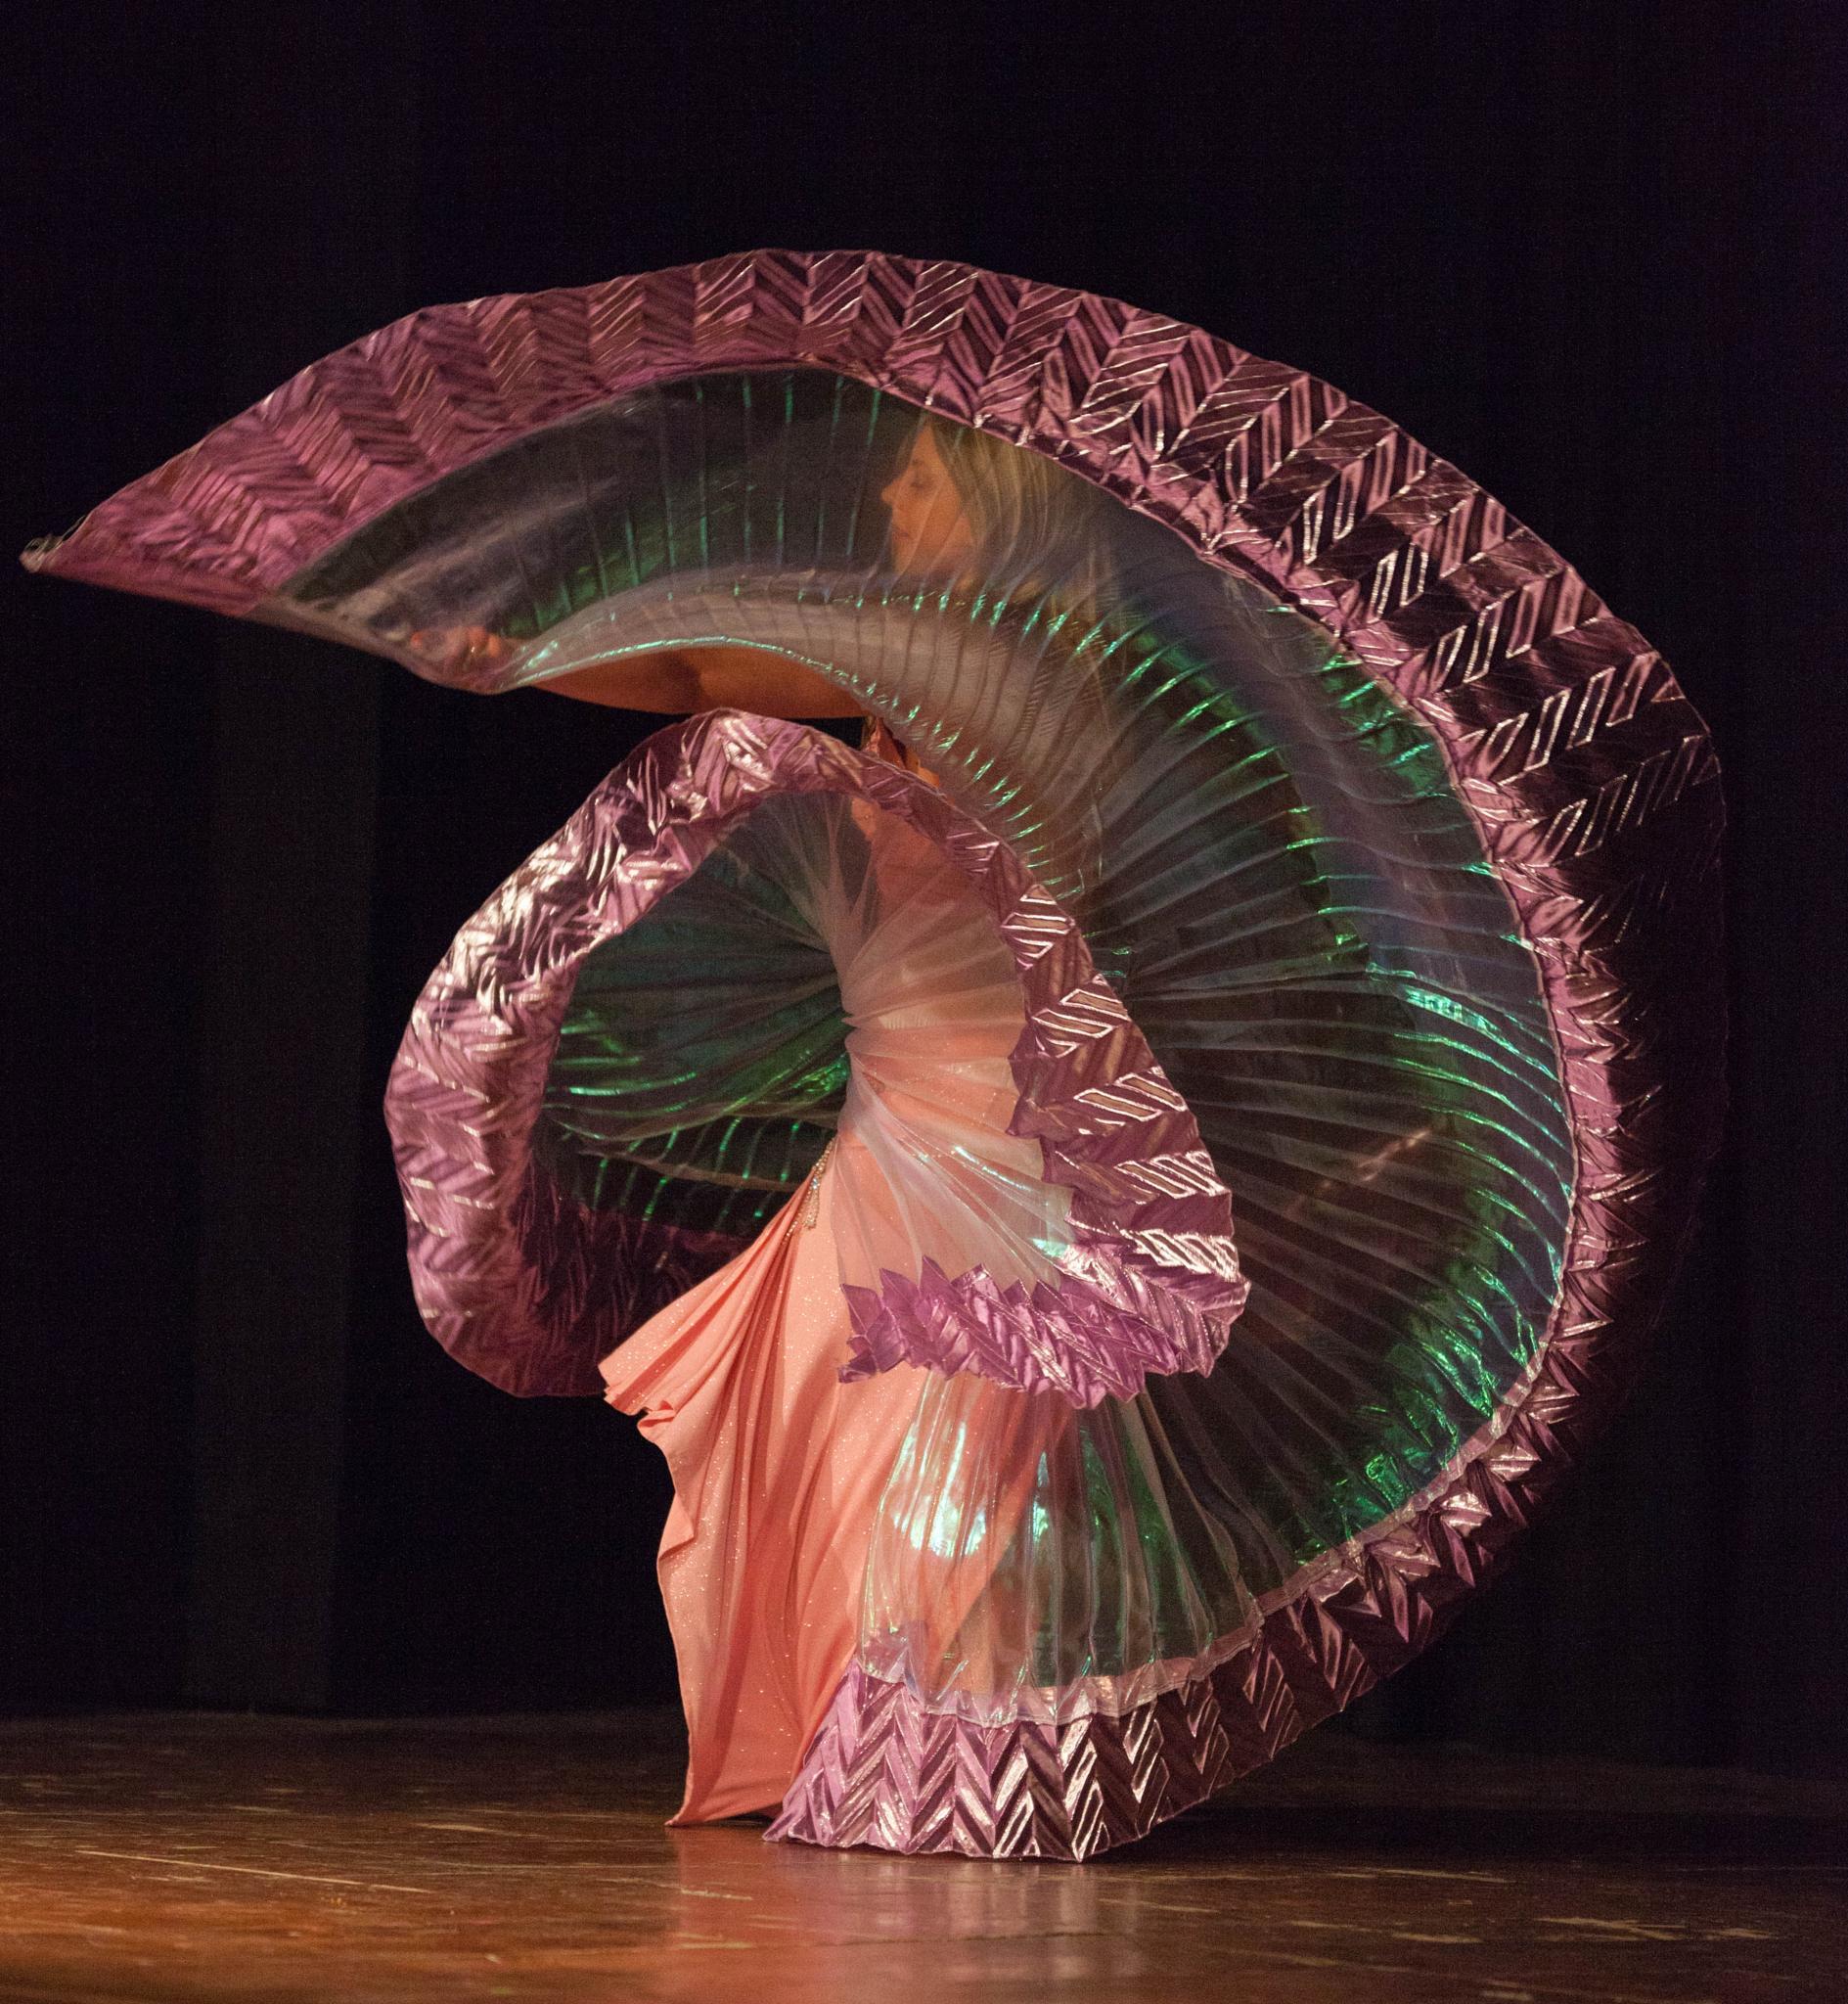 danza arcobaleno by Patrizia Emmepi